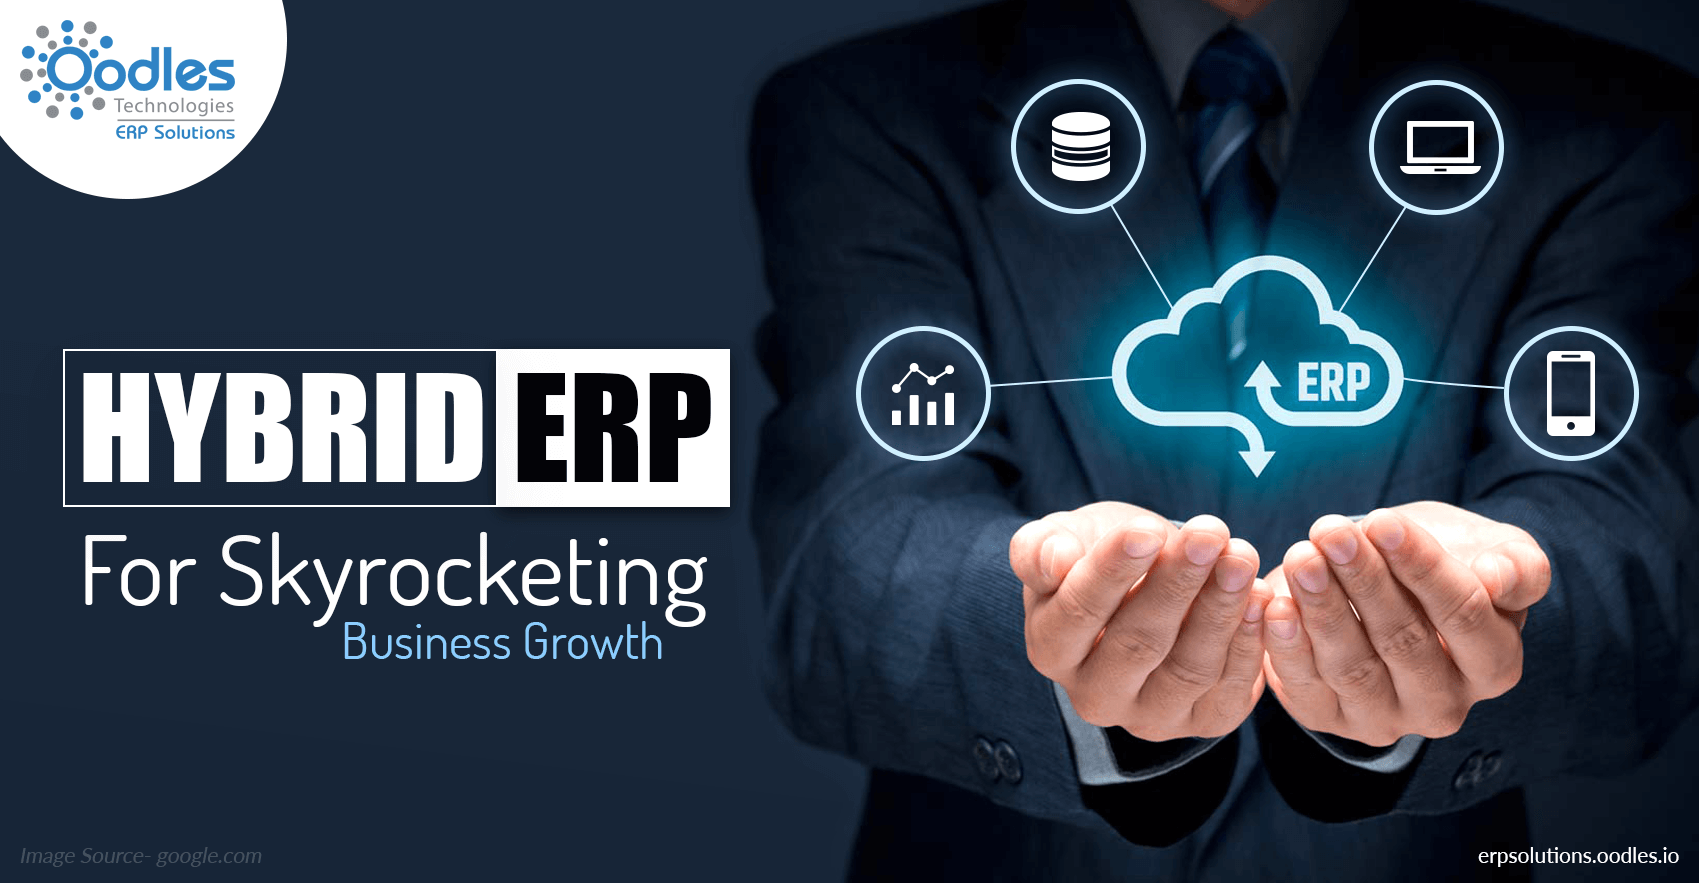 Hybrid Erp For Skyrocketing Business Growth